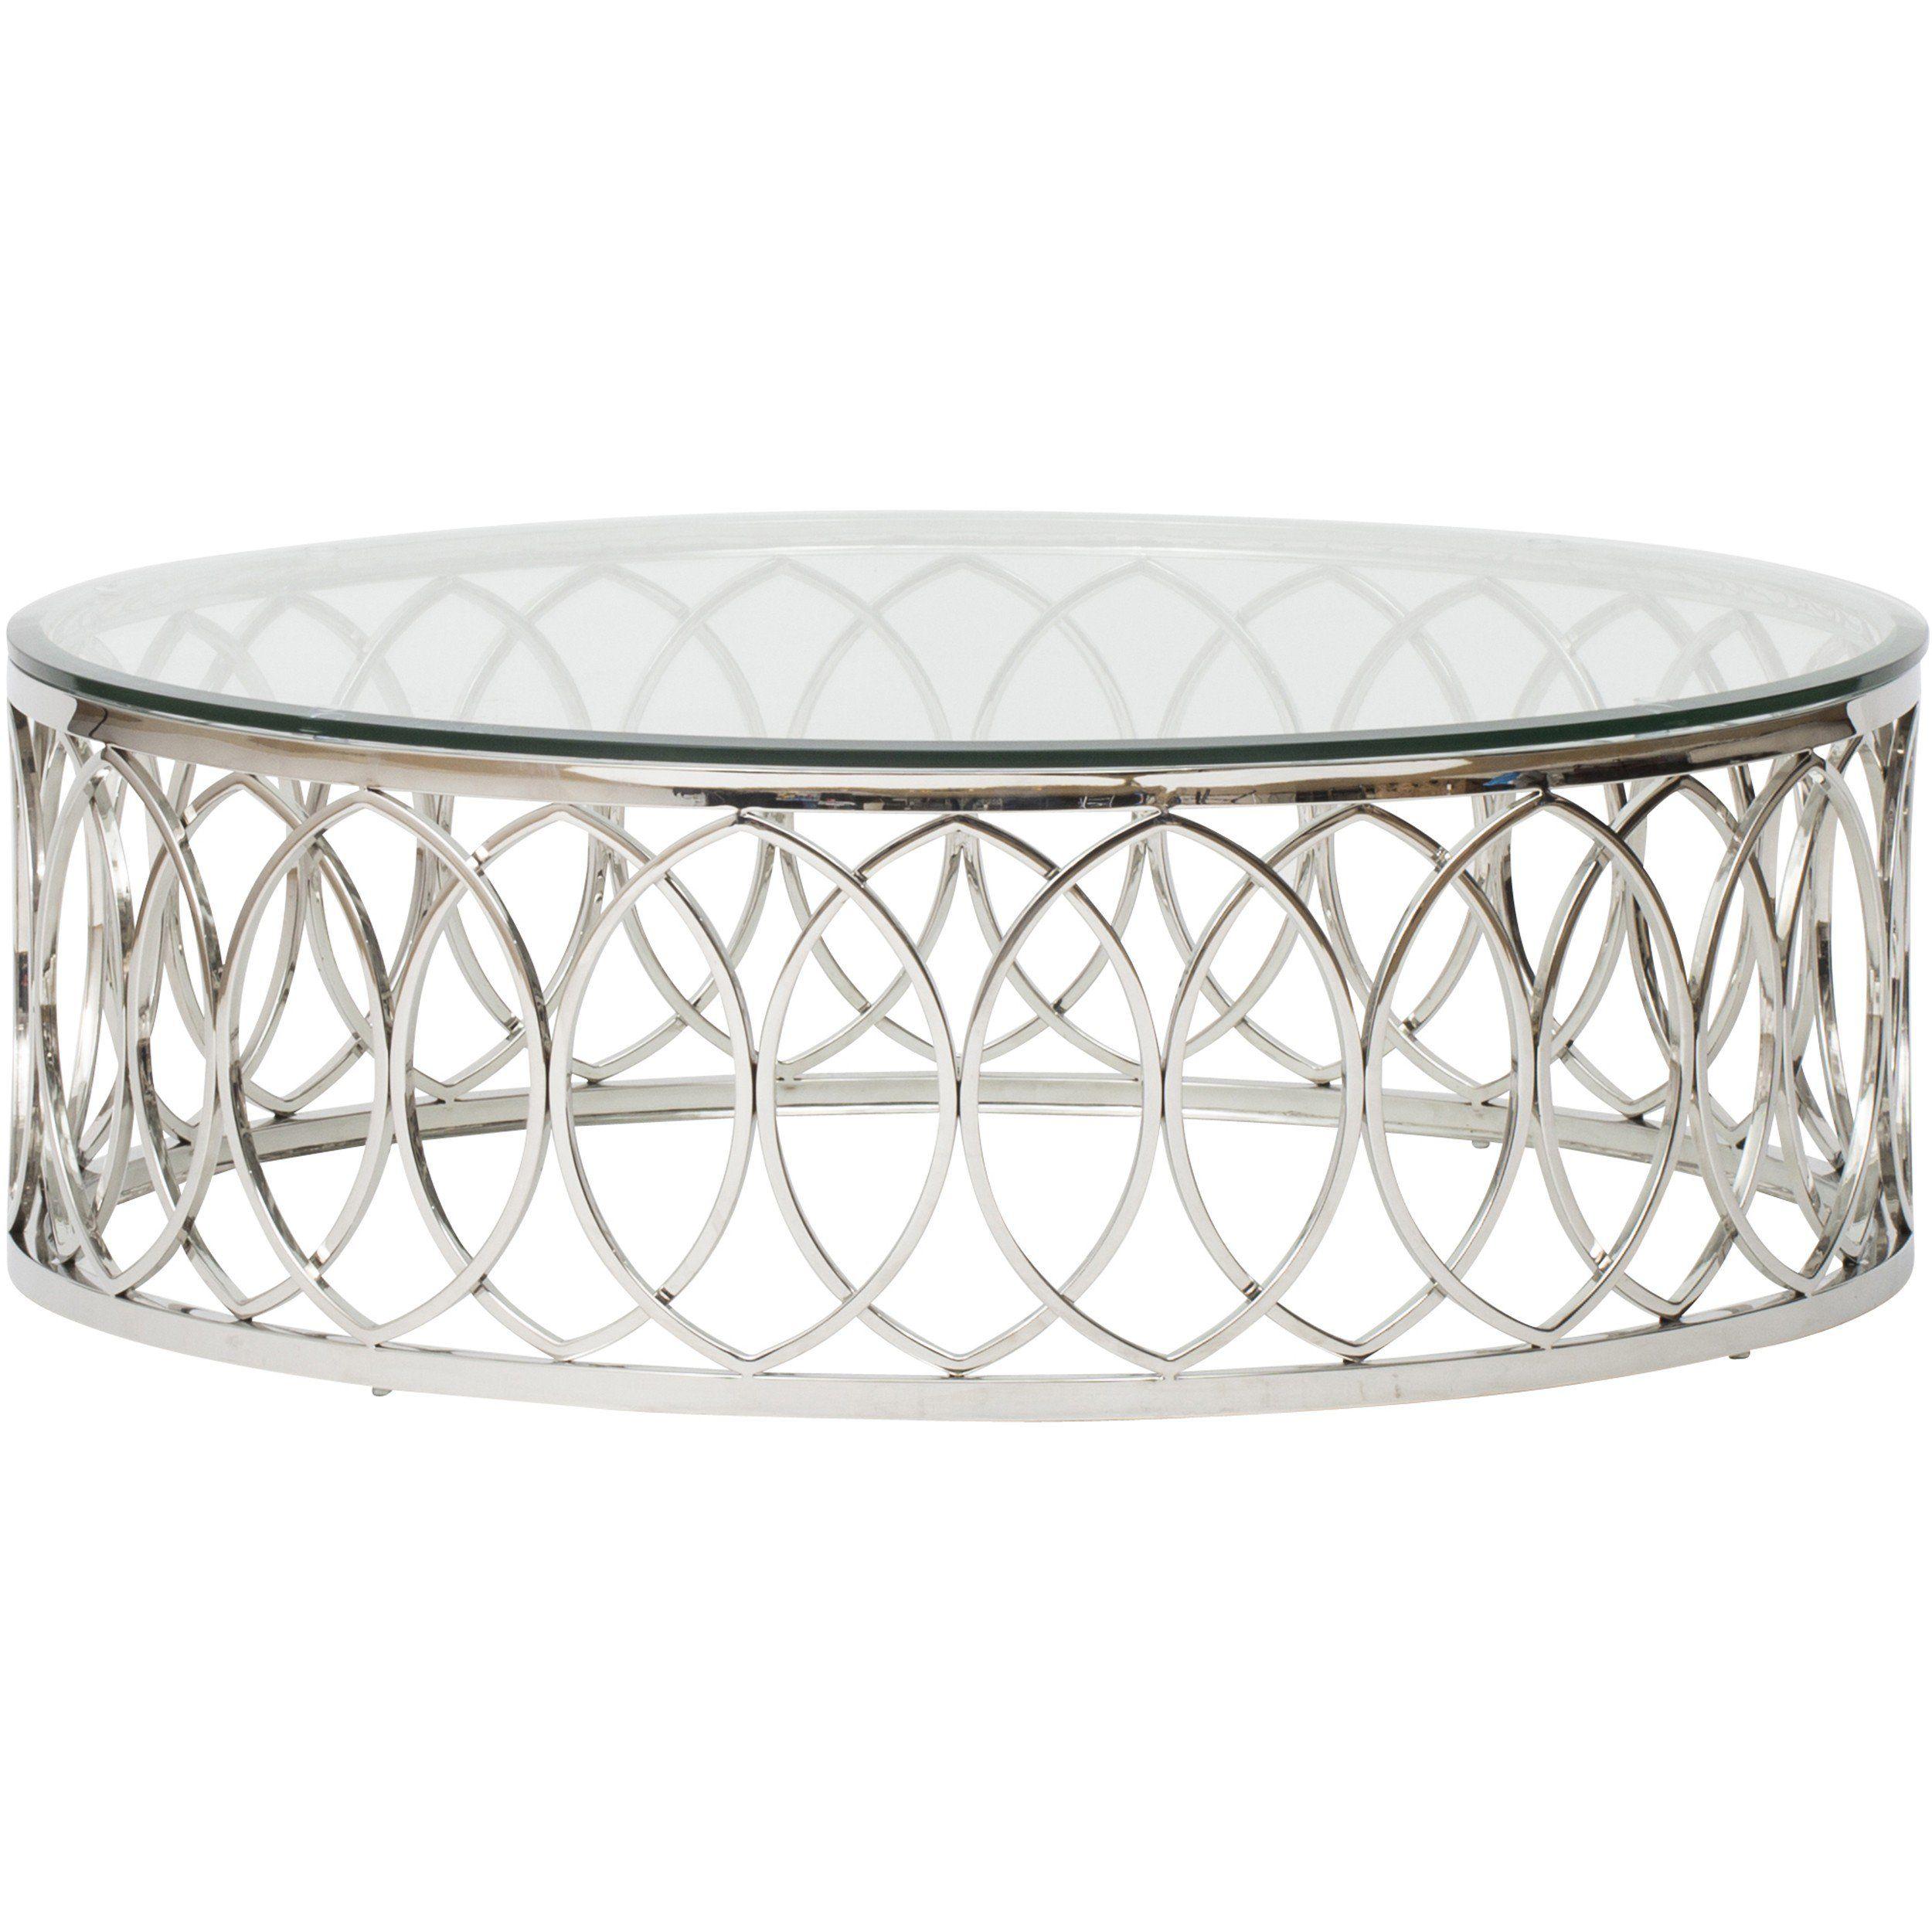 Juliette Coffee Table In 2019 Coffee Table Furniture